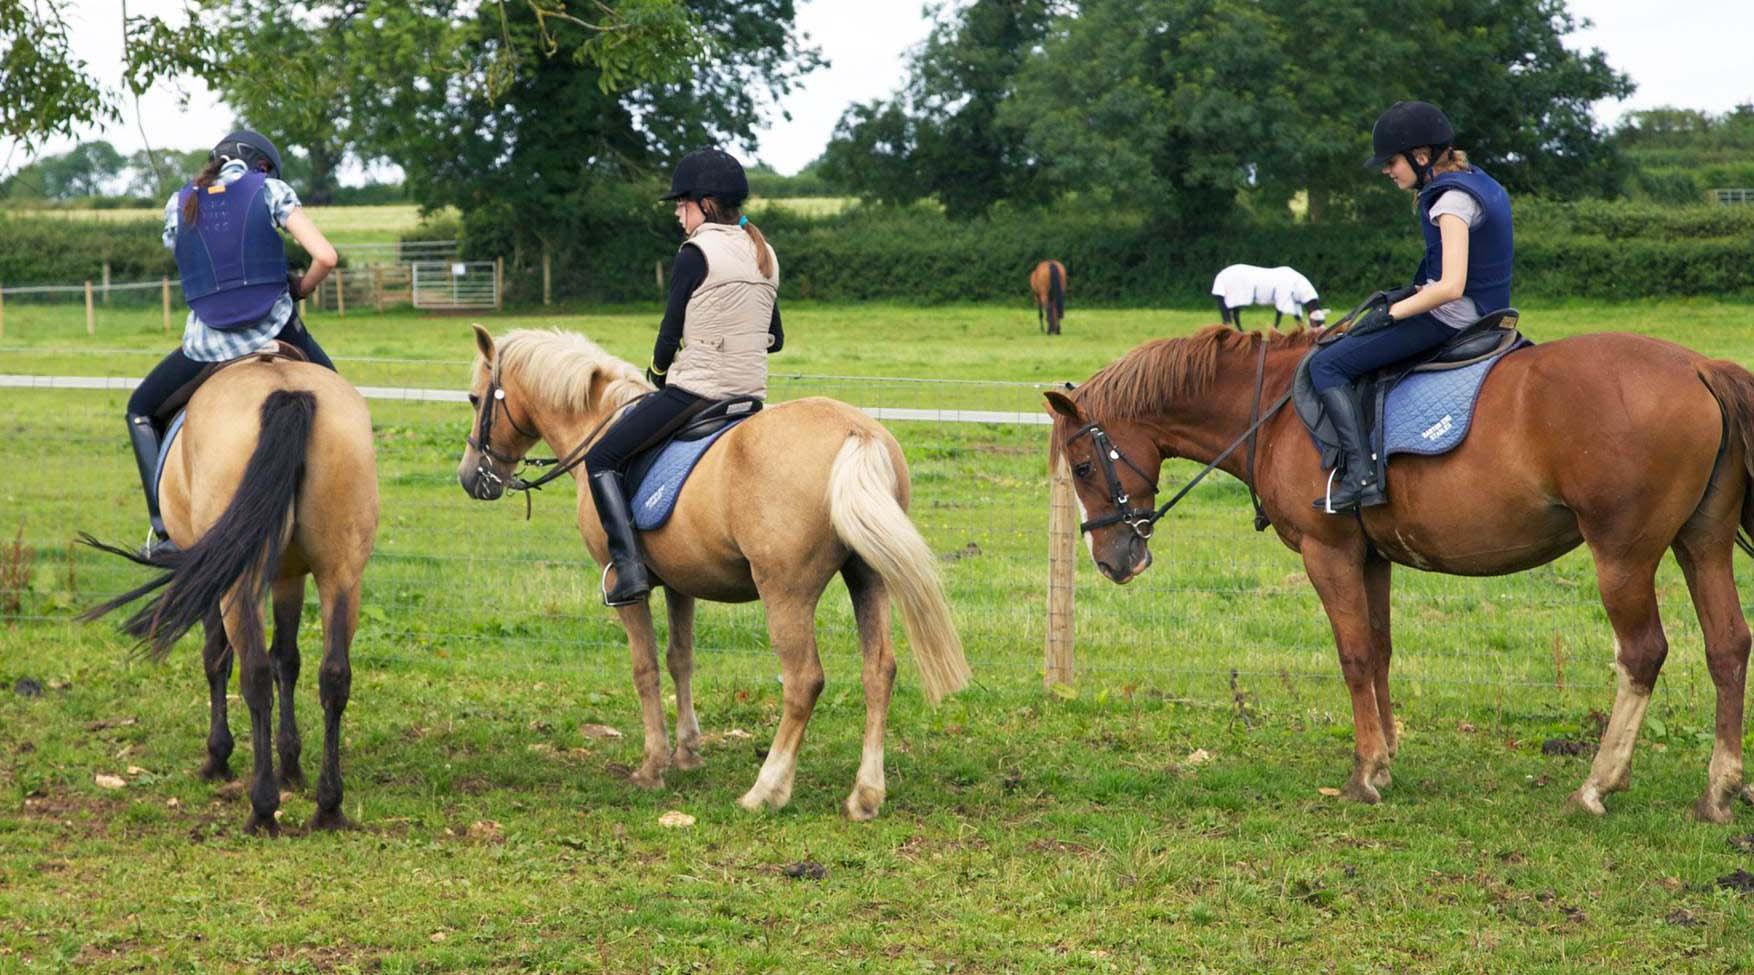 029. Horse Riding